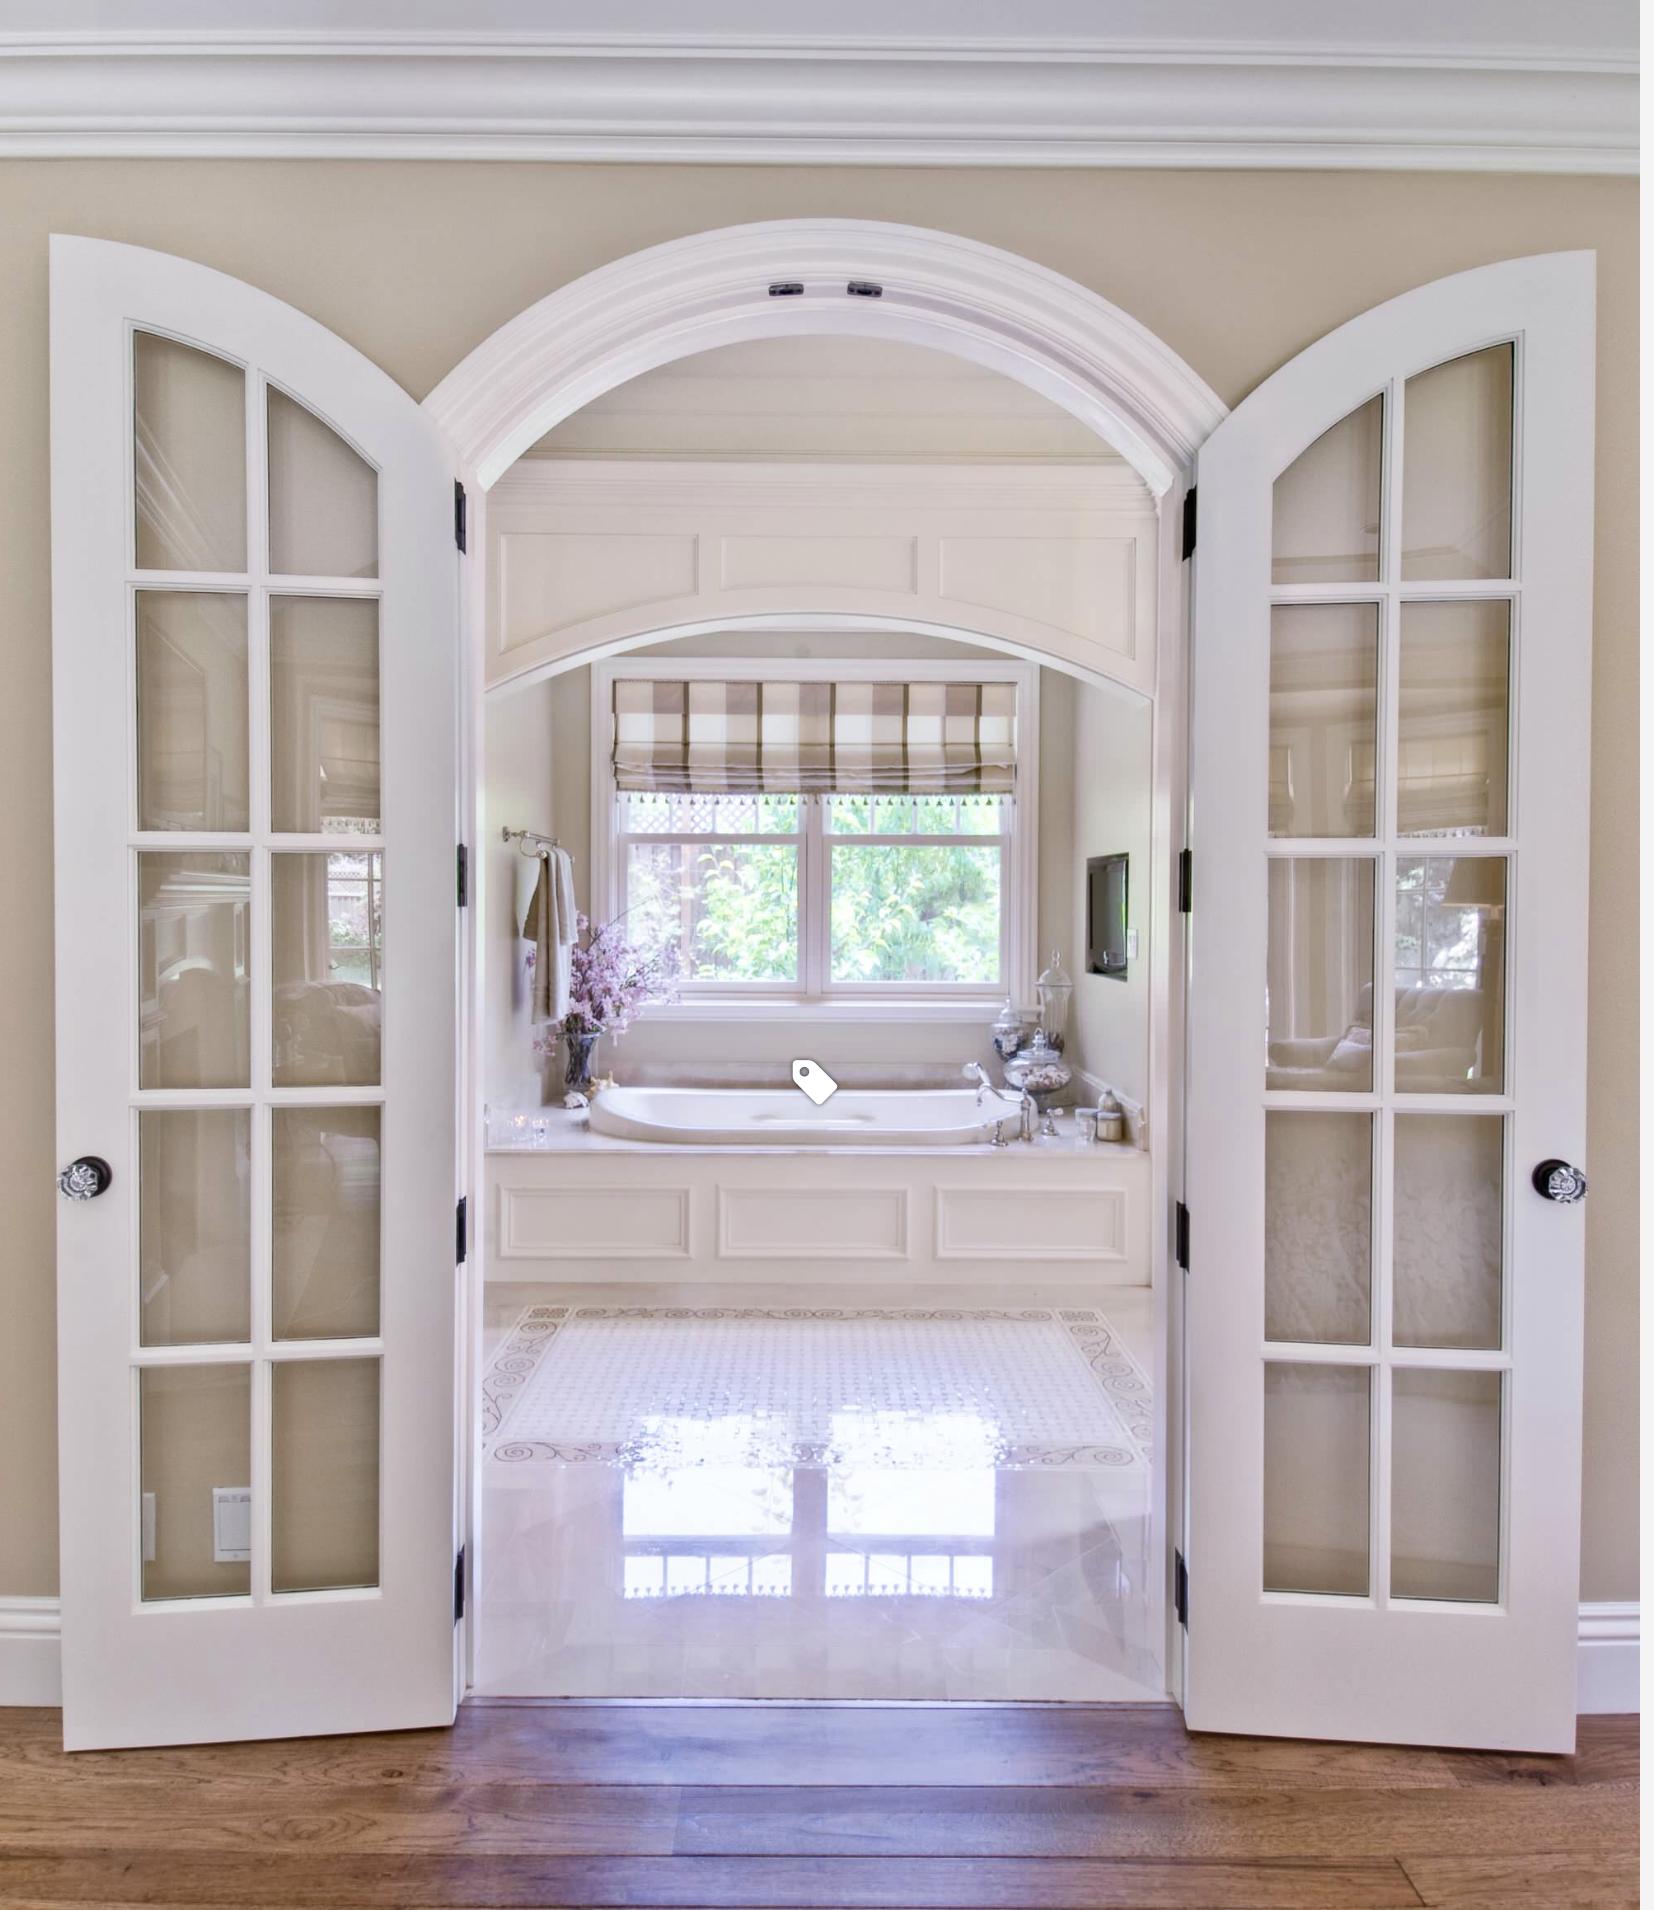 Screen Shot 20180715 at 13.09.38 Arched interior doors